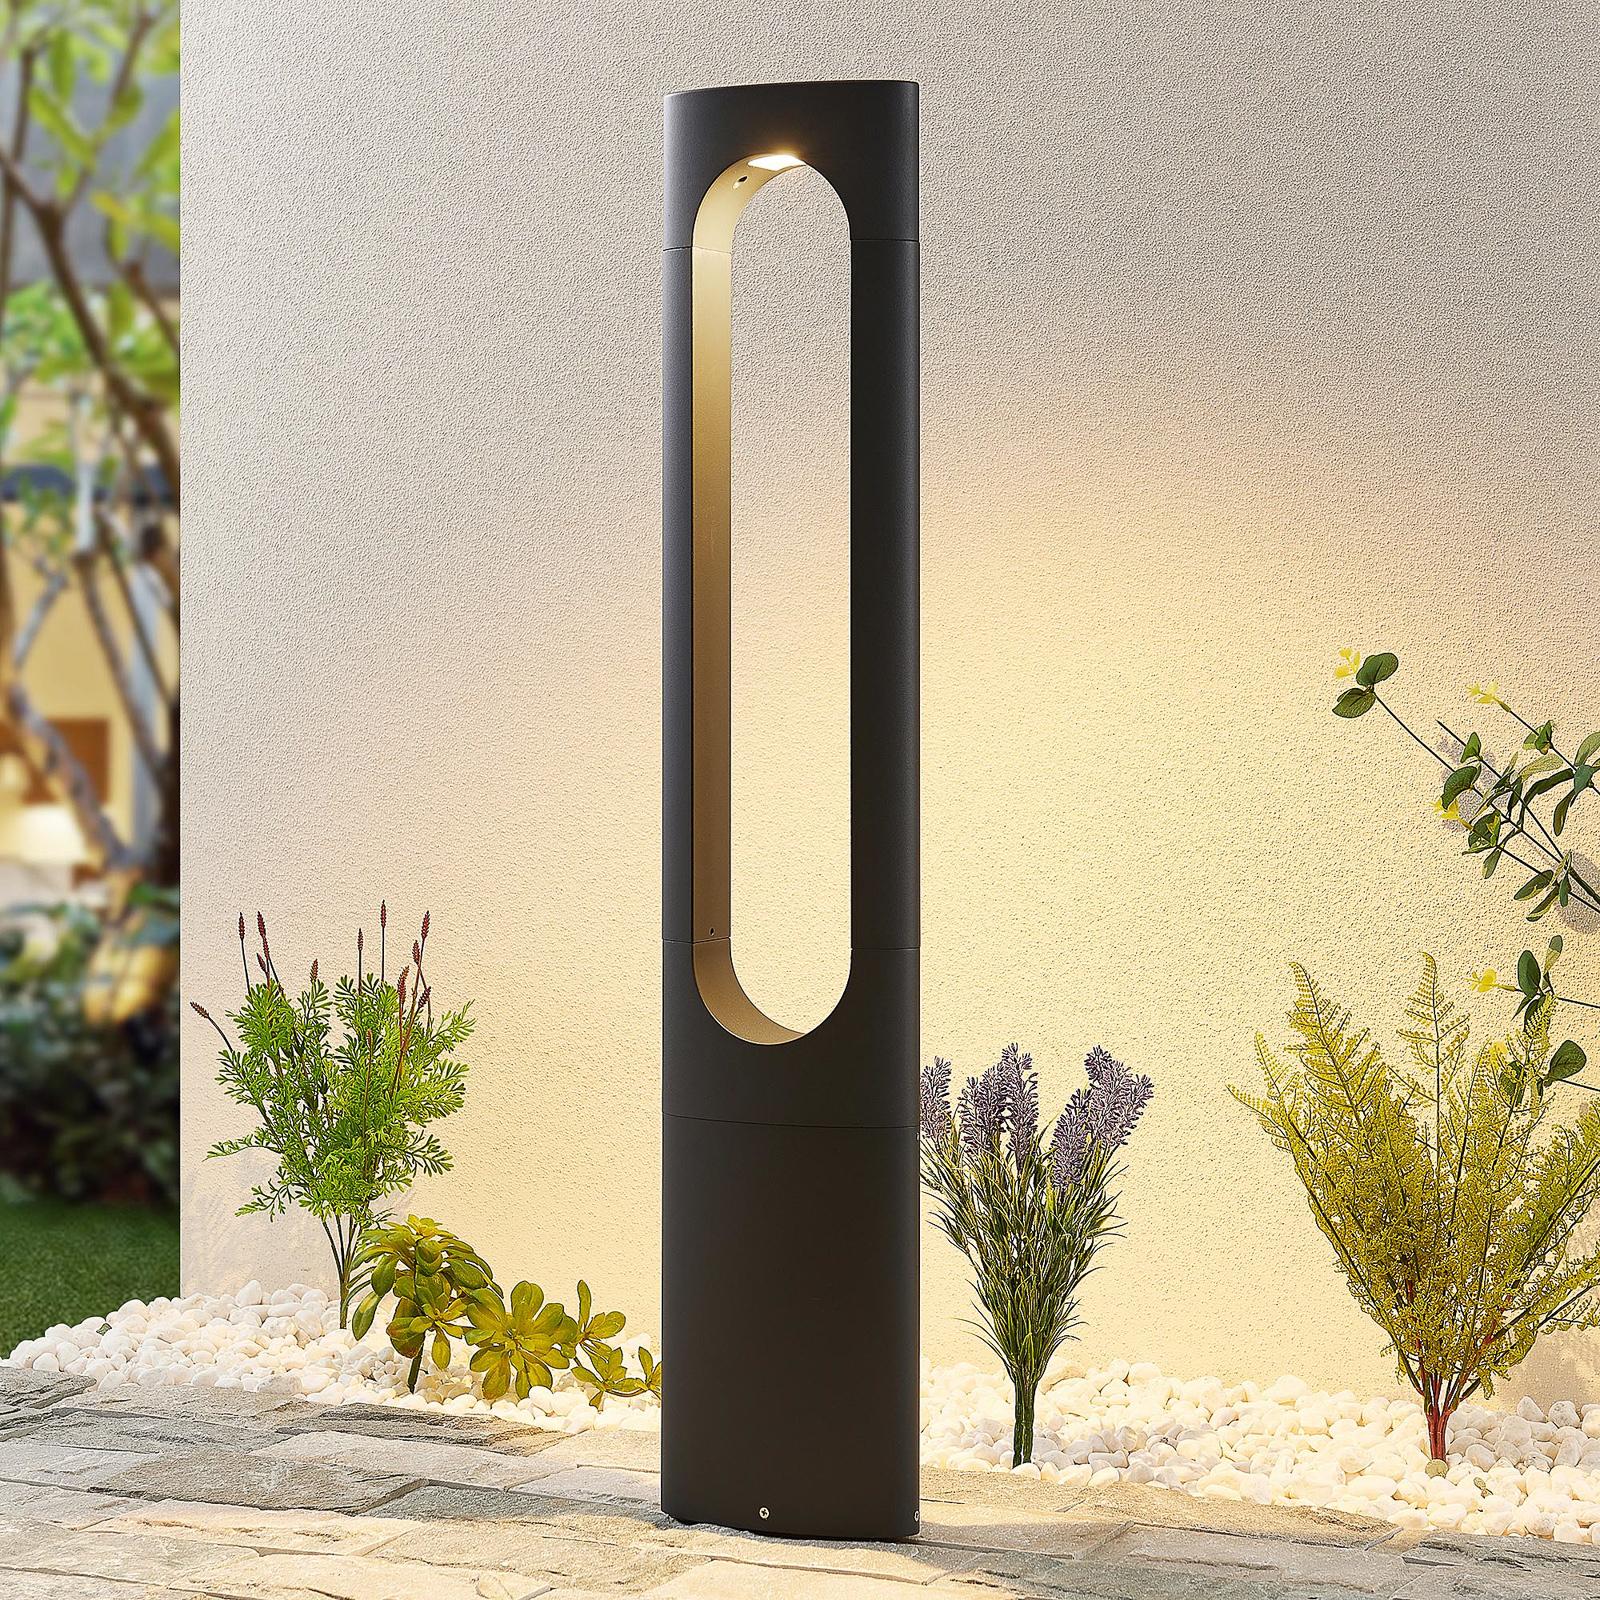 Lucande Fenti LED tuinpadverlichting, 90 cm